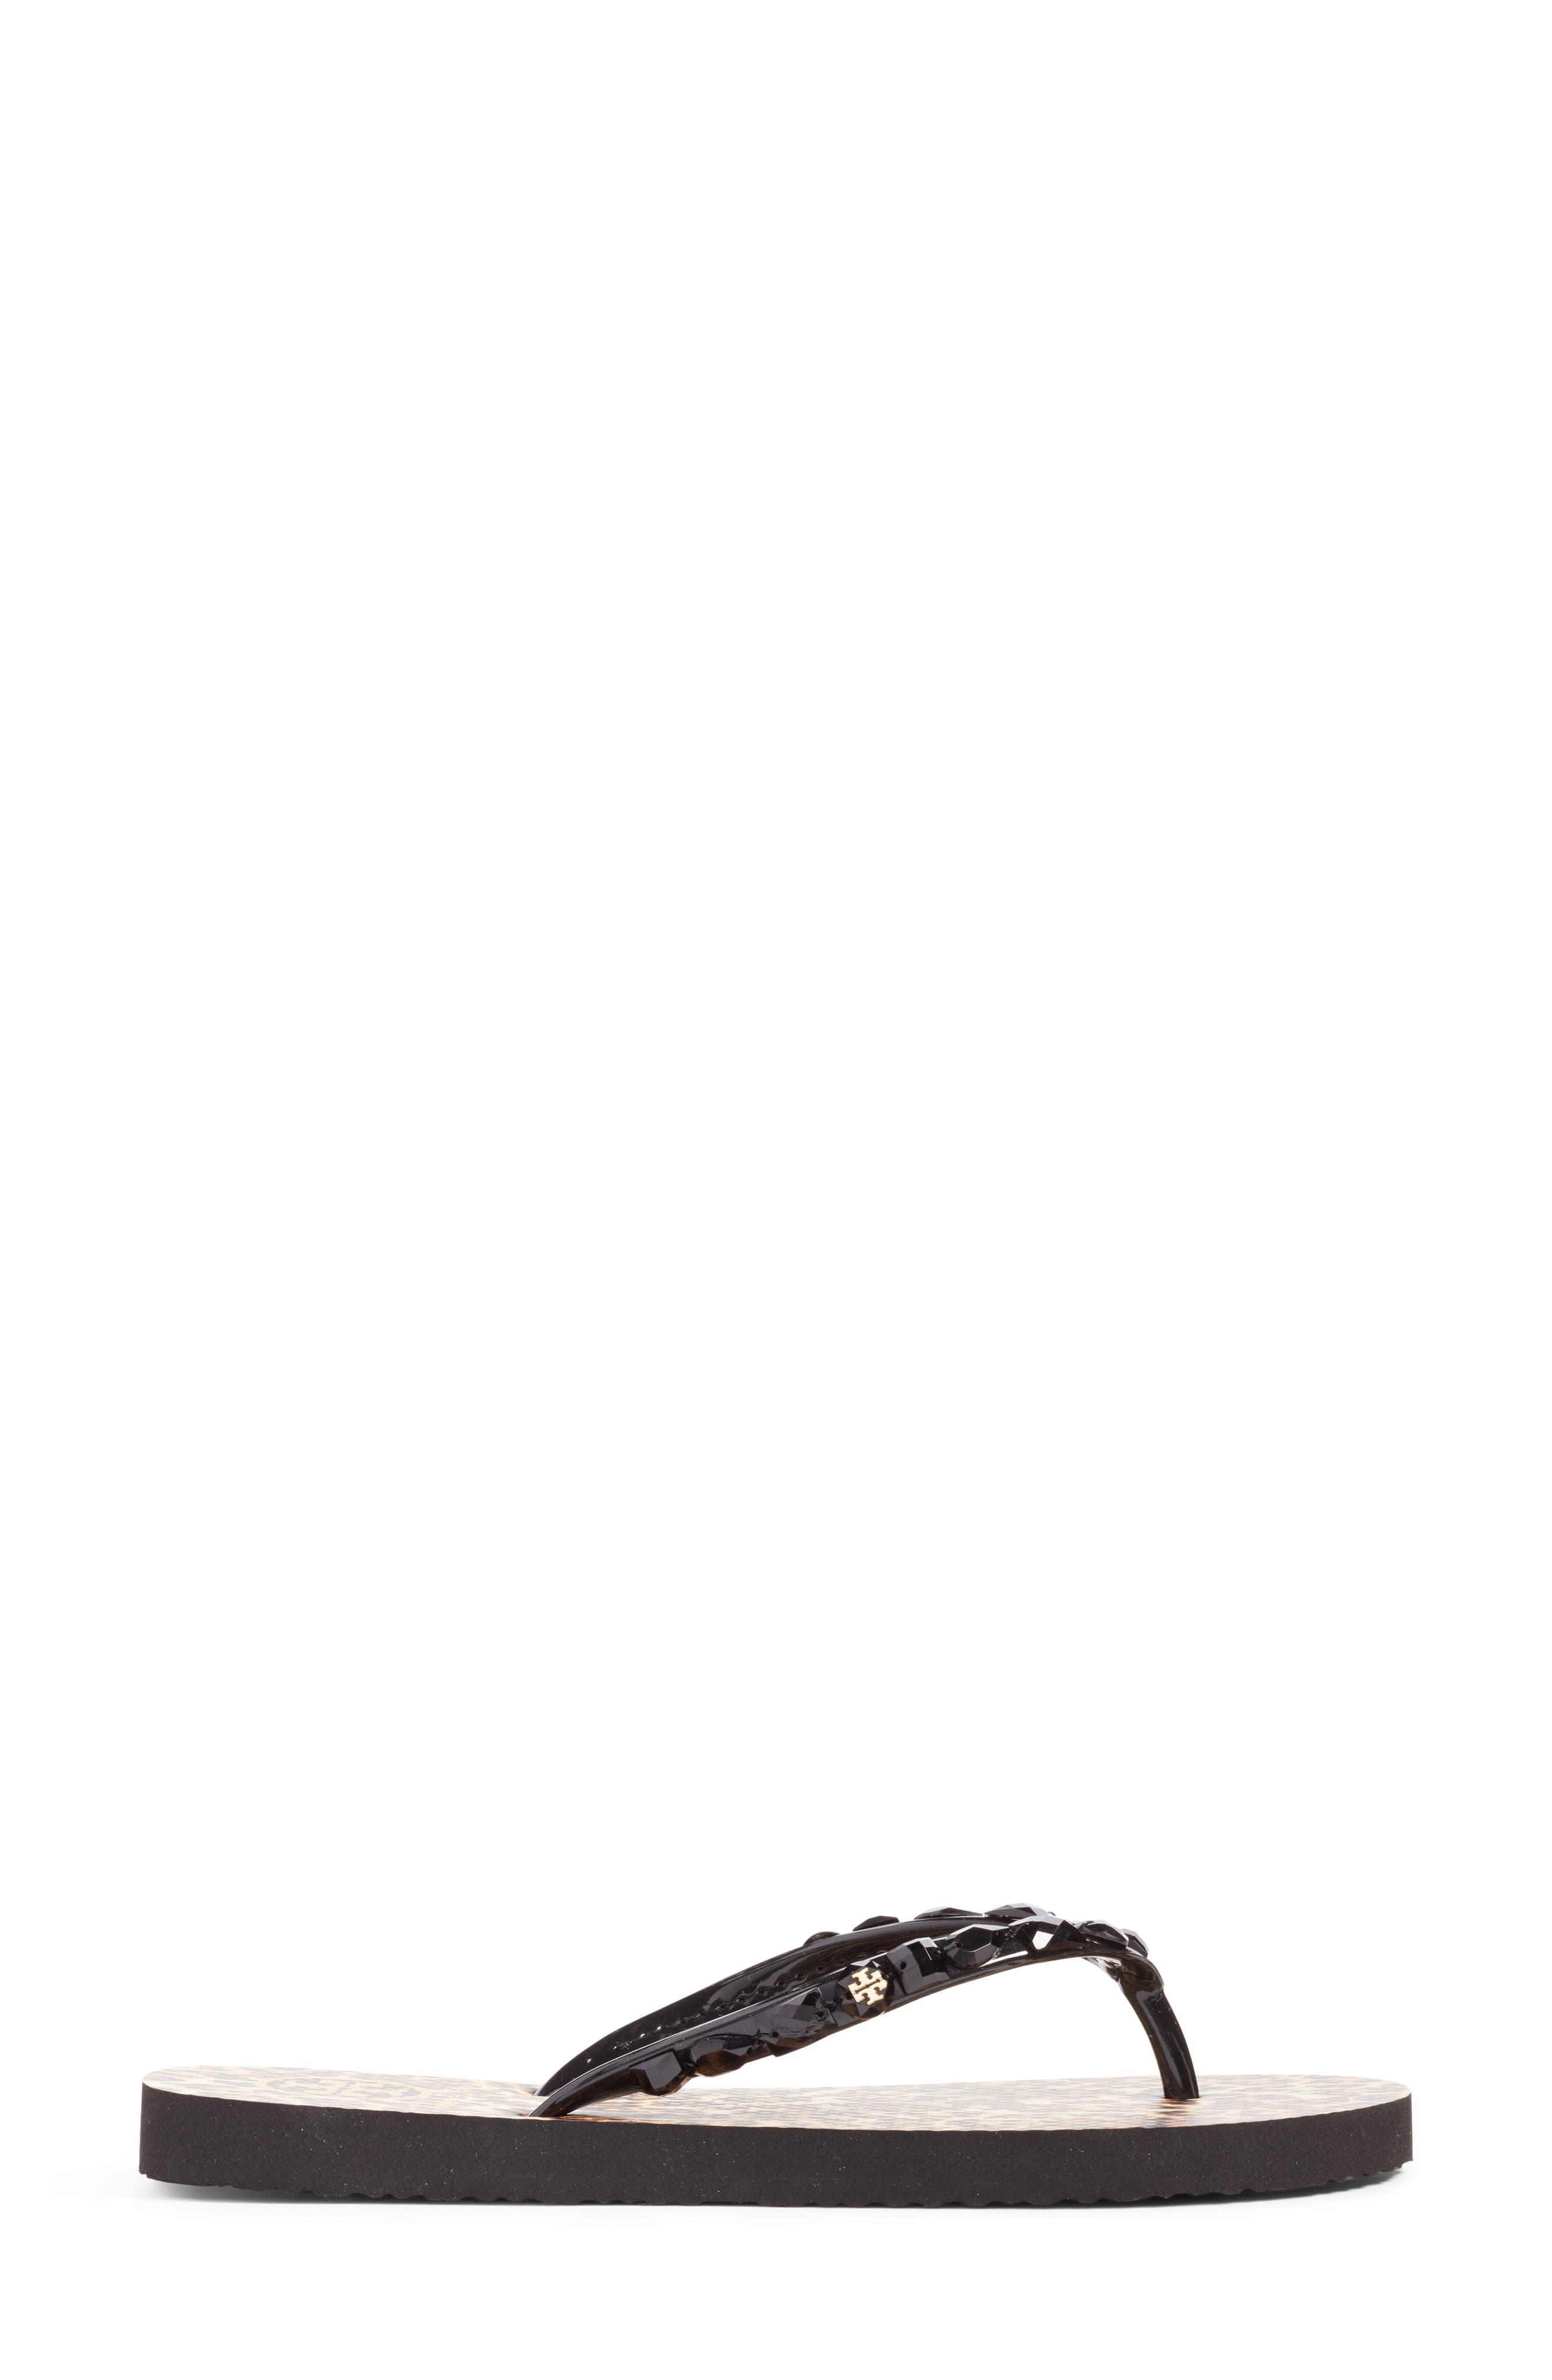 Alternate Image 3  - Tory Burch Embellished Flip-Flop (Women)